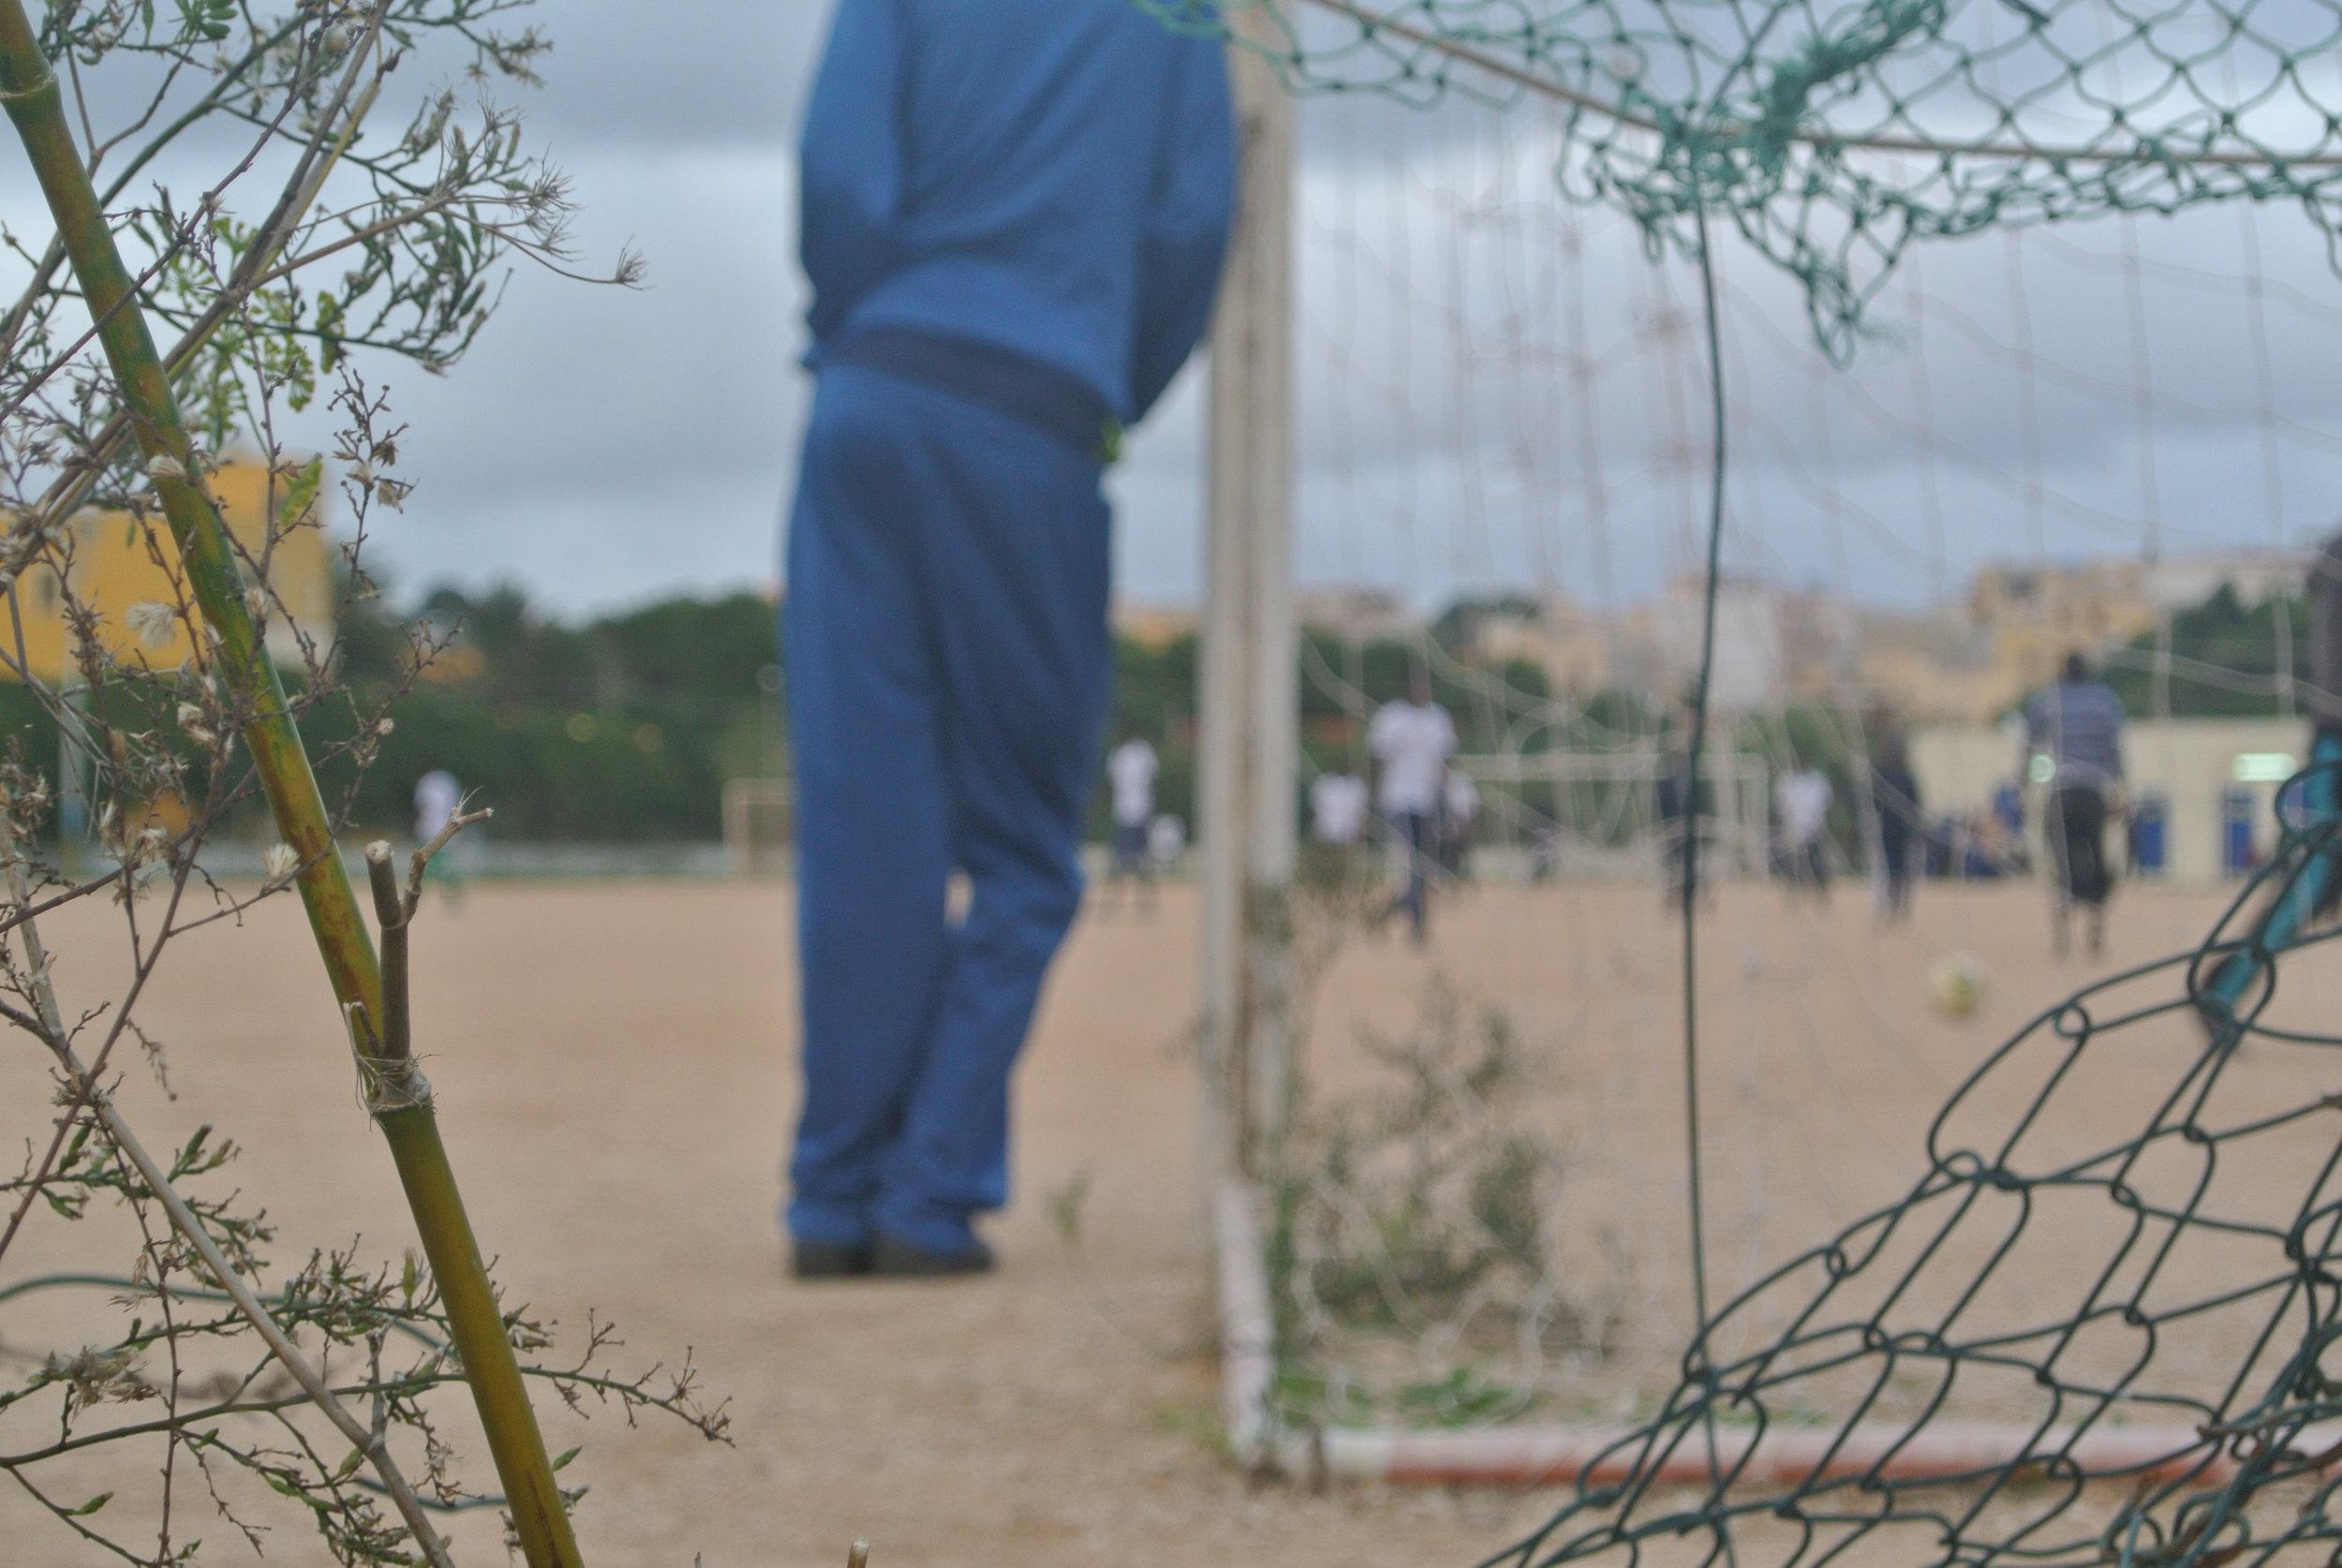 football_fence.jpg